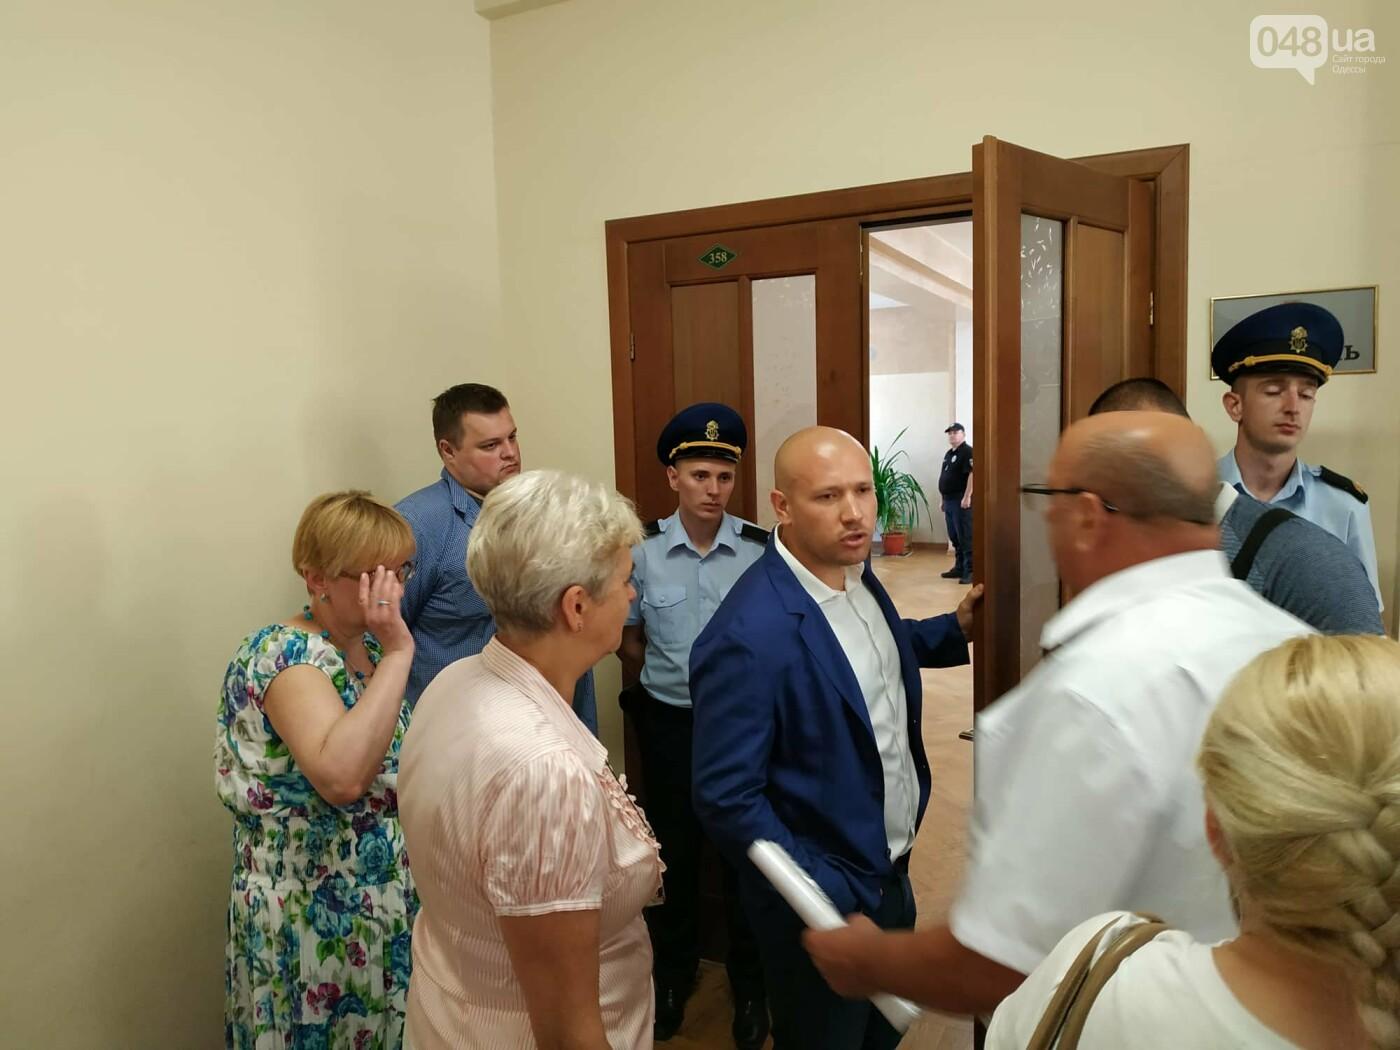 Стало известно, кто возглавил Одесский областной совет, - ФОТО, фото-7, Фото: Александр Жирносенко